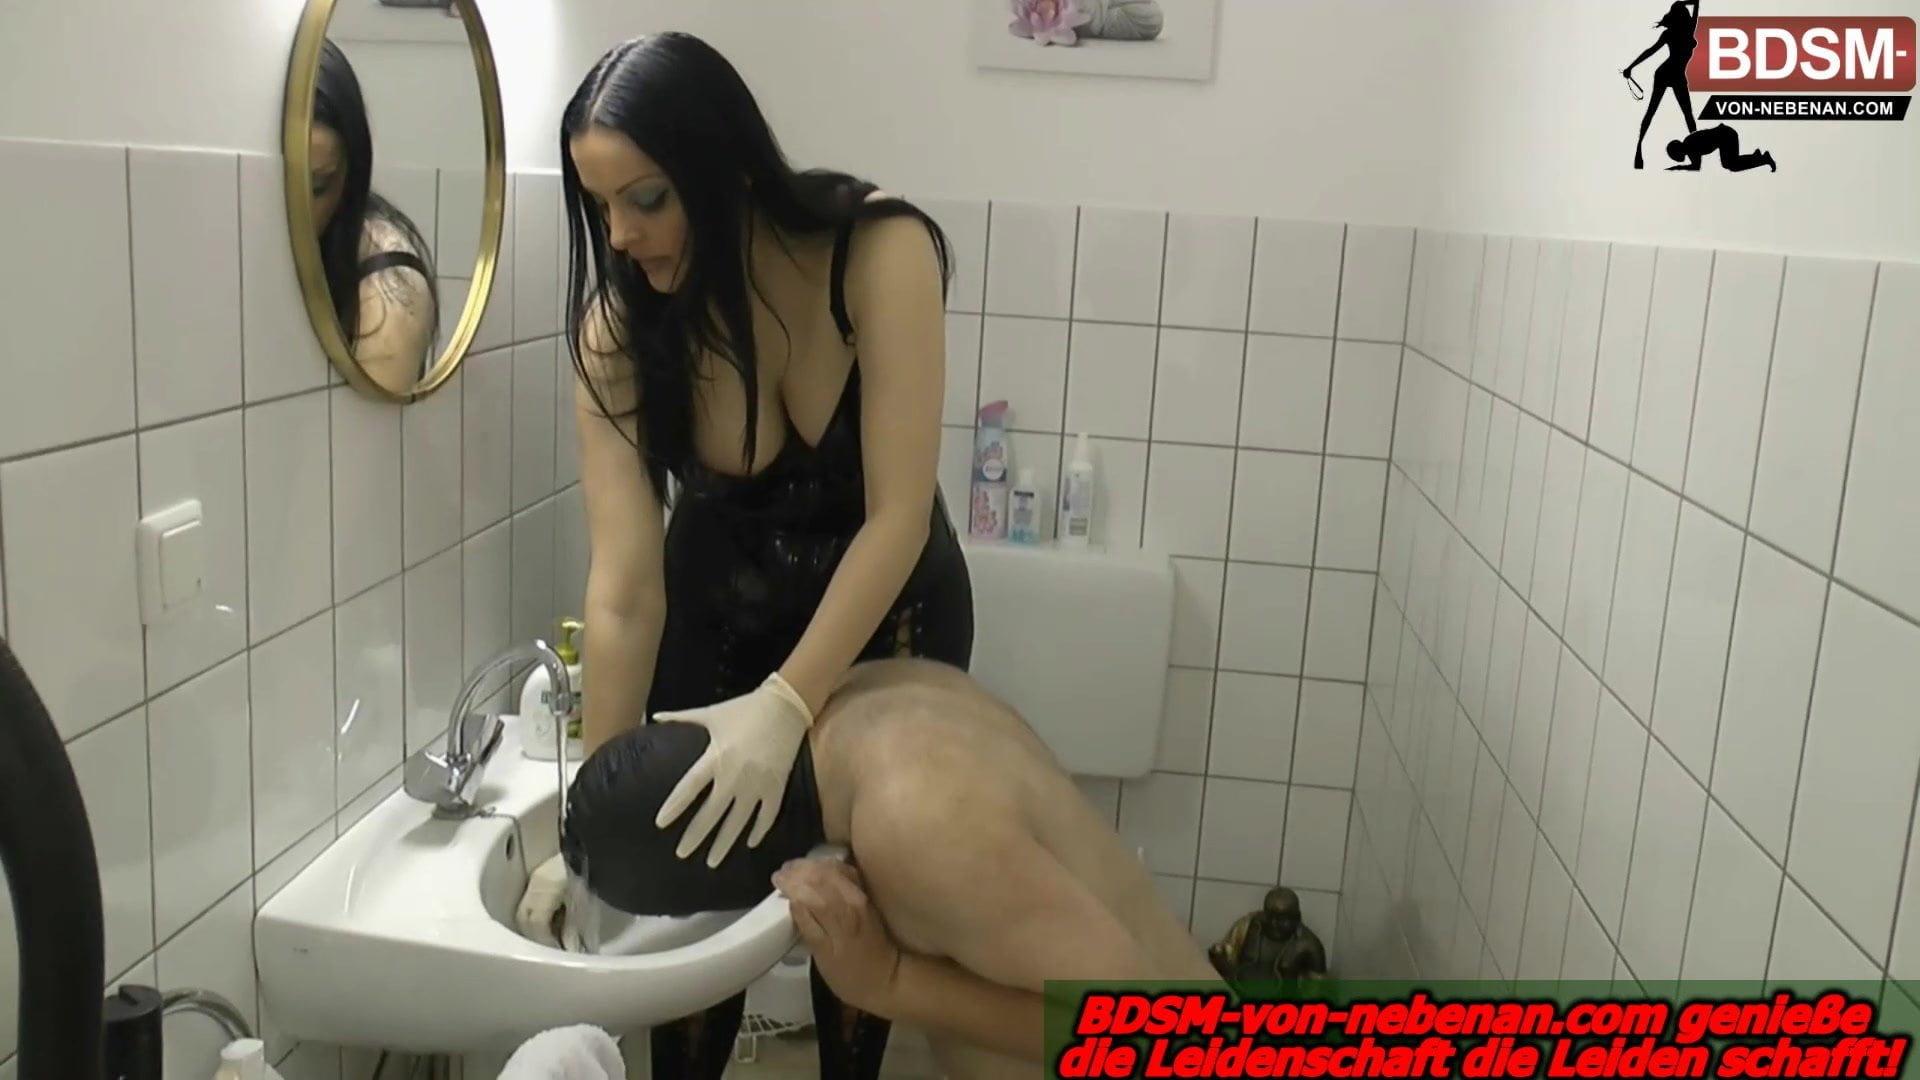 Slave vertrages femdom geschichten toilet